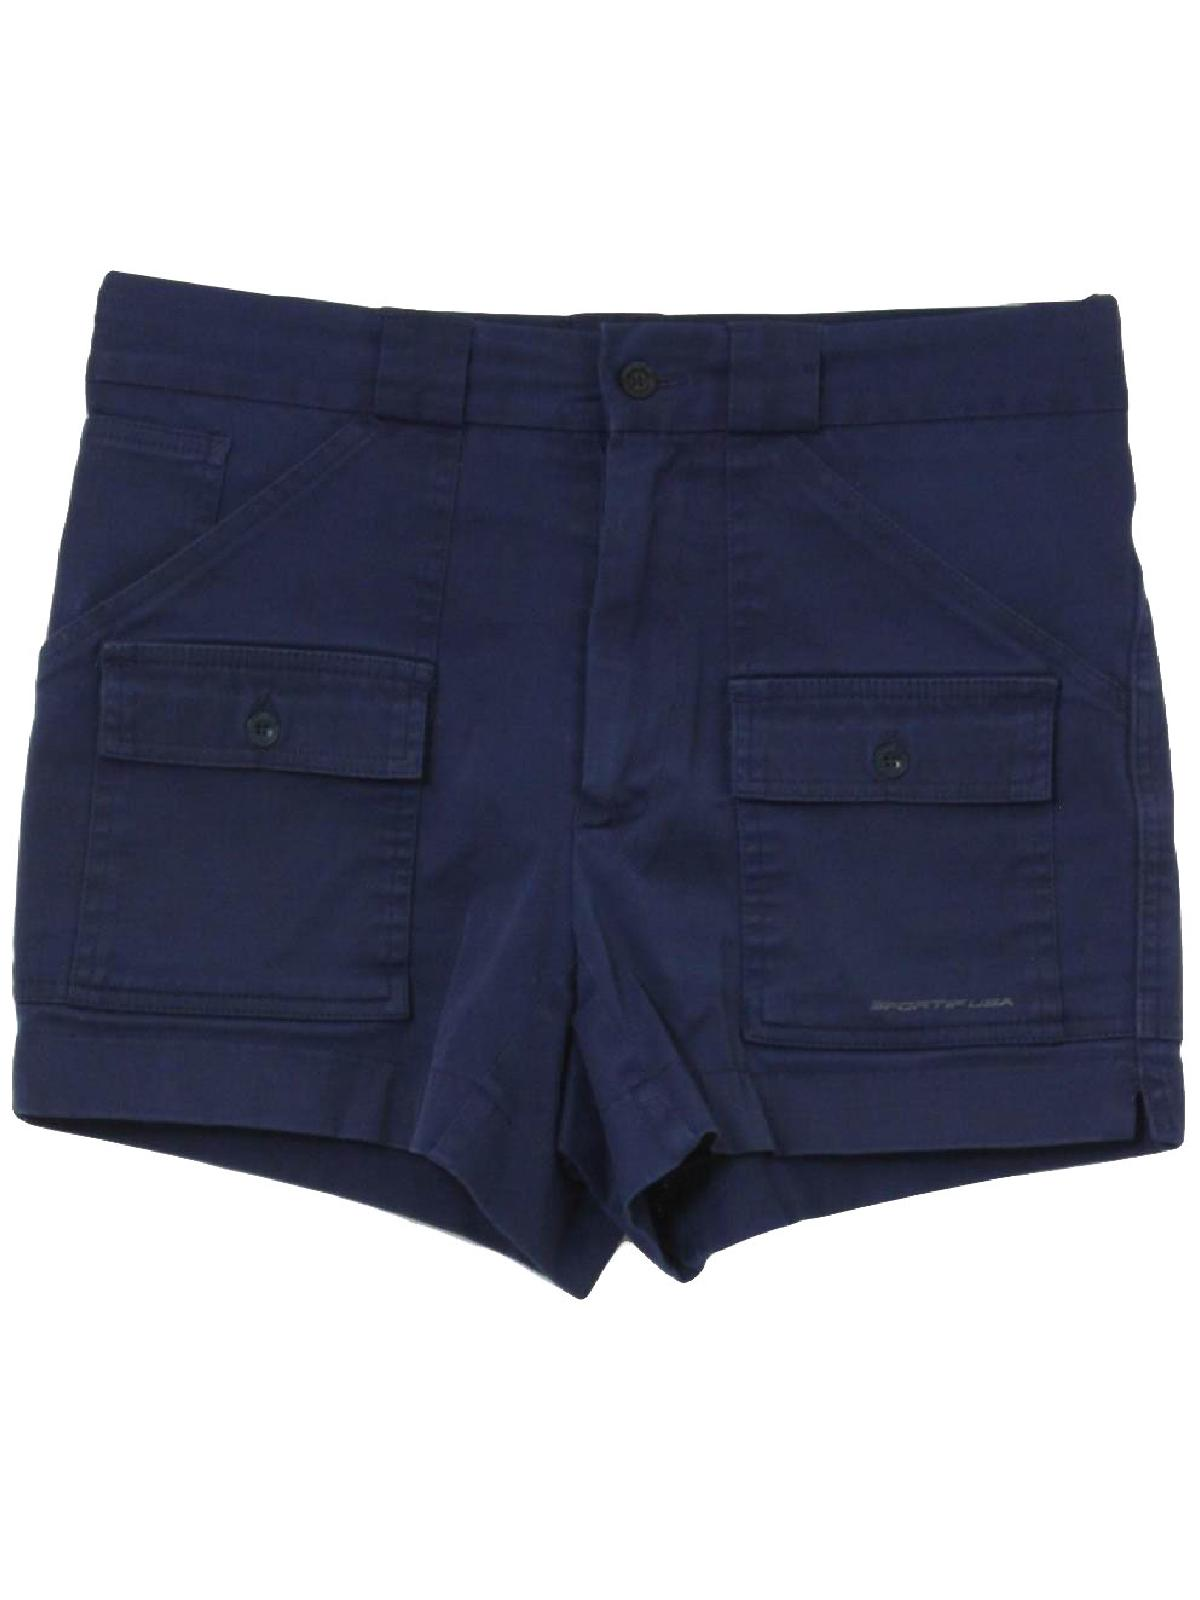 Retro 90's Shorts: 90s (80s look) -Sportif- Mens navy blue ...